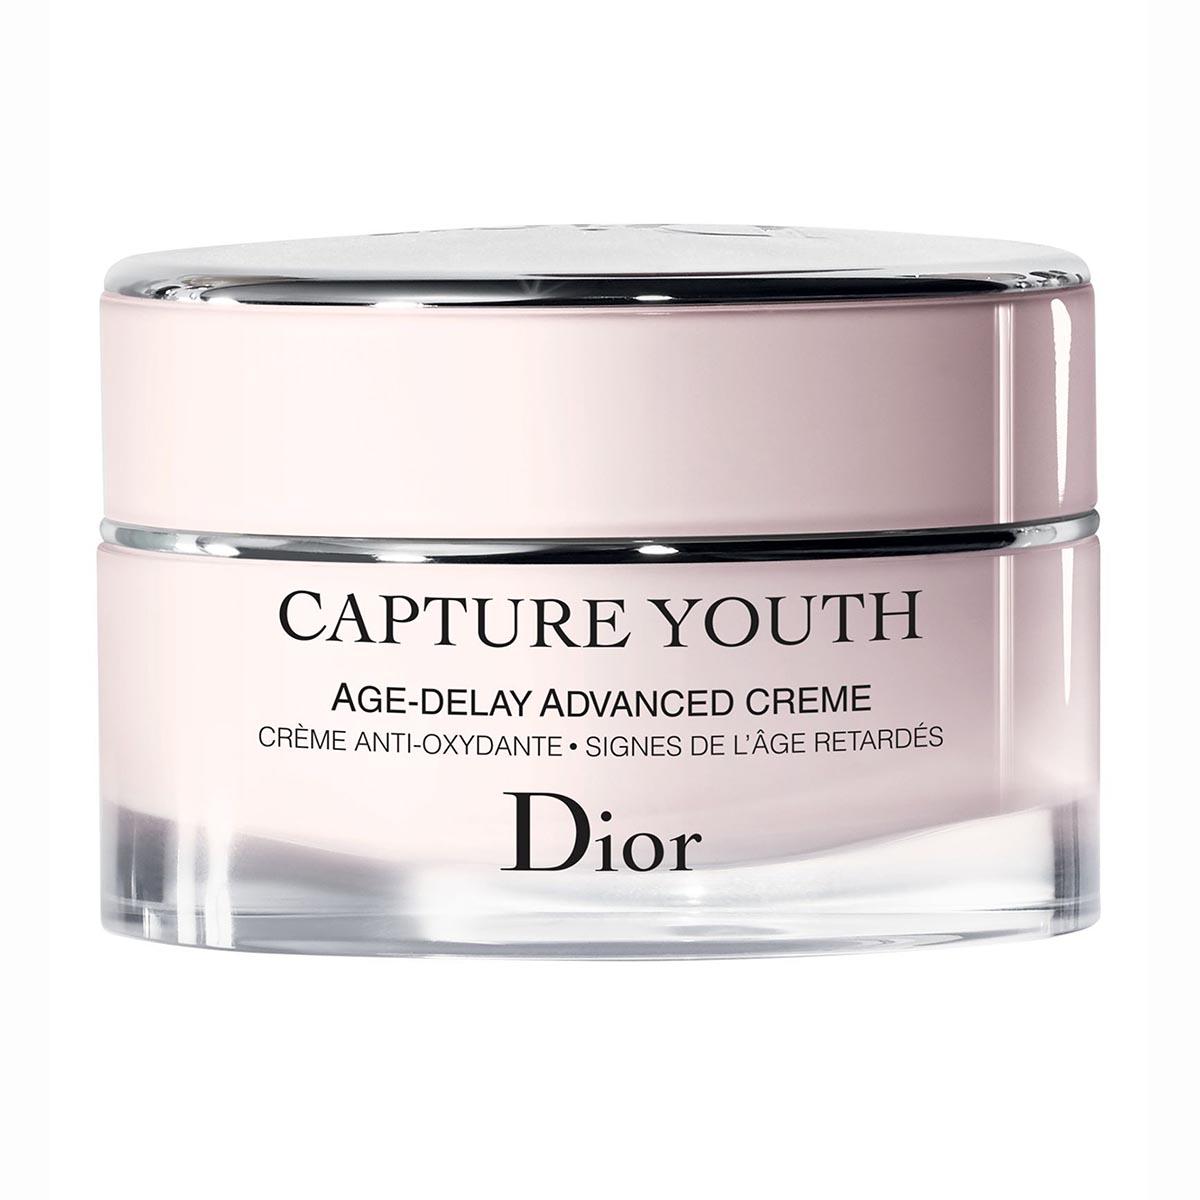 Dior capture youth age delay advanced creme 50ml